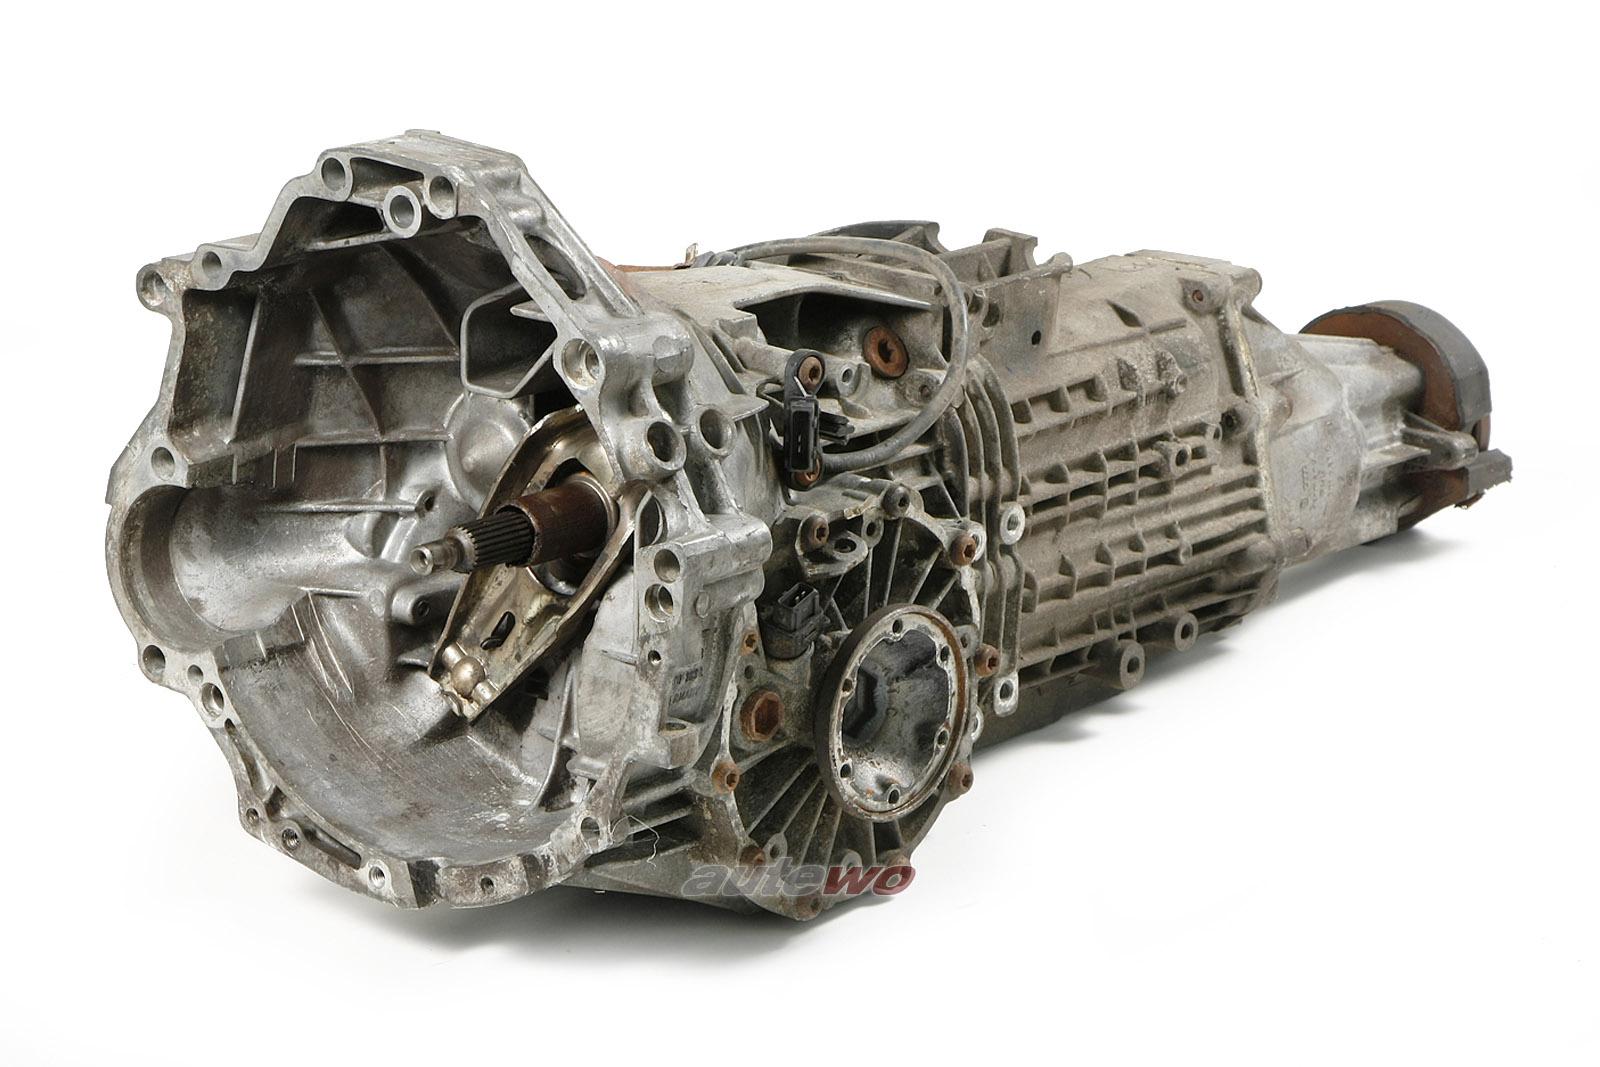 01A300044E Audi 80 B4 Competition/100/A6 C4 2.0l Getriebe Quattro CVV 05104